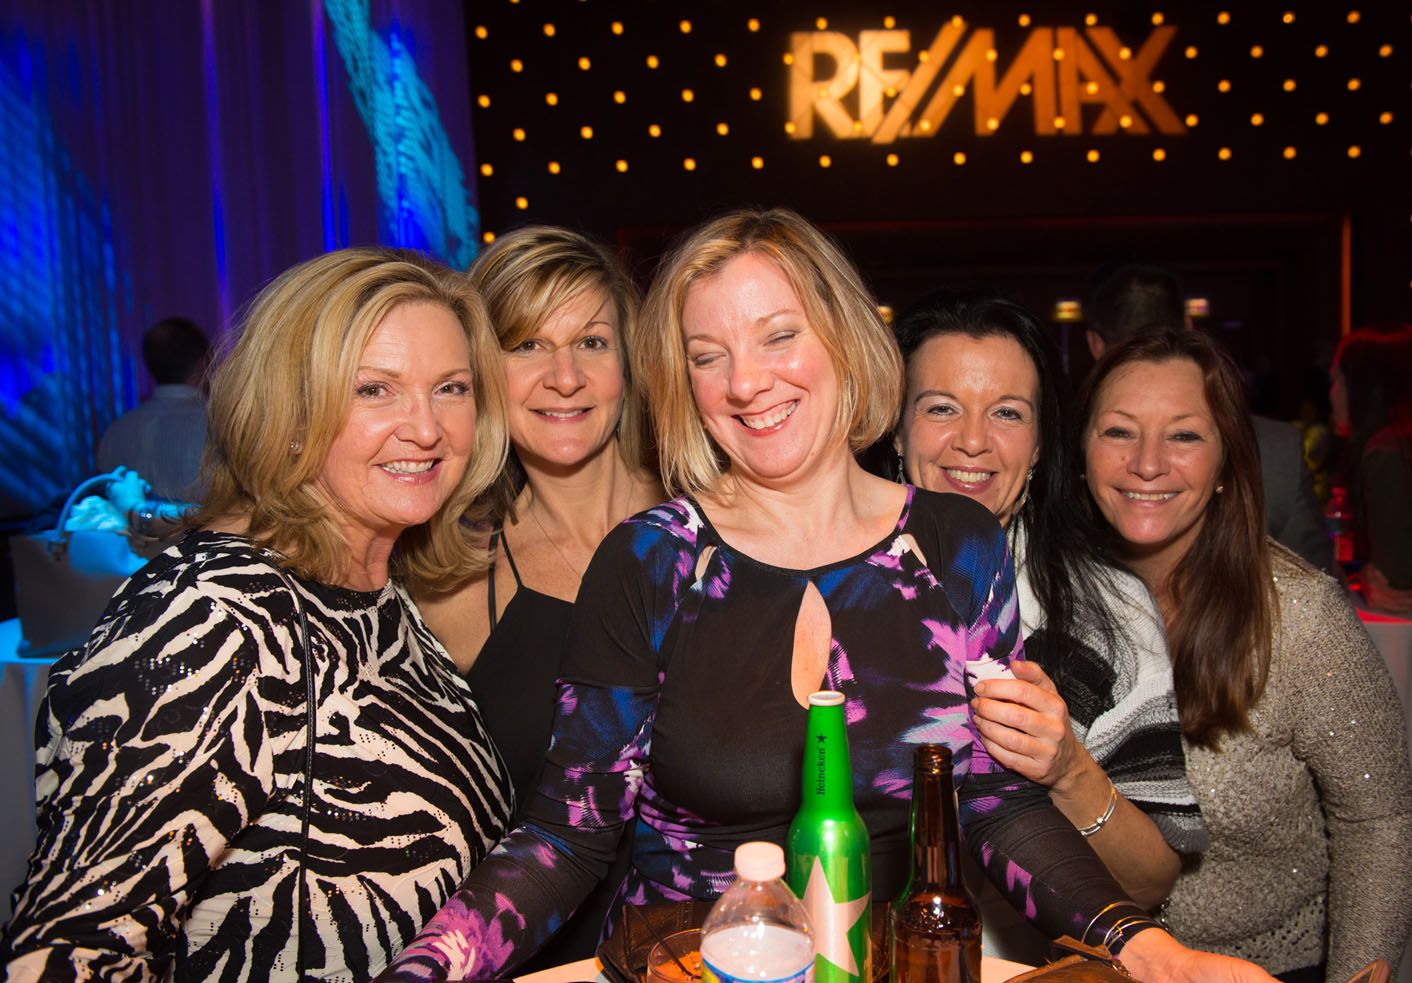 2015-12-09 ReMax Corpoarte Event - The Borgata - Atlantic City NJ - Photo Sesh - 2015-5243.jpg